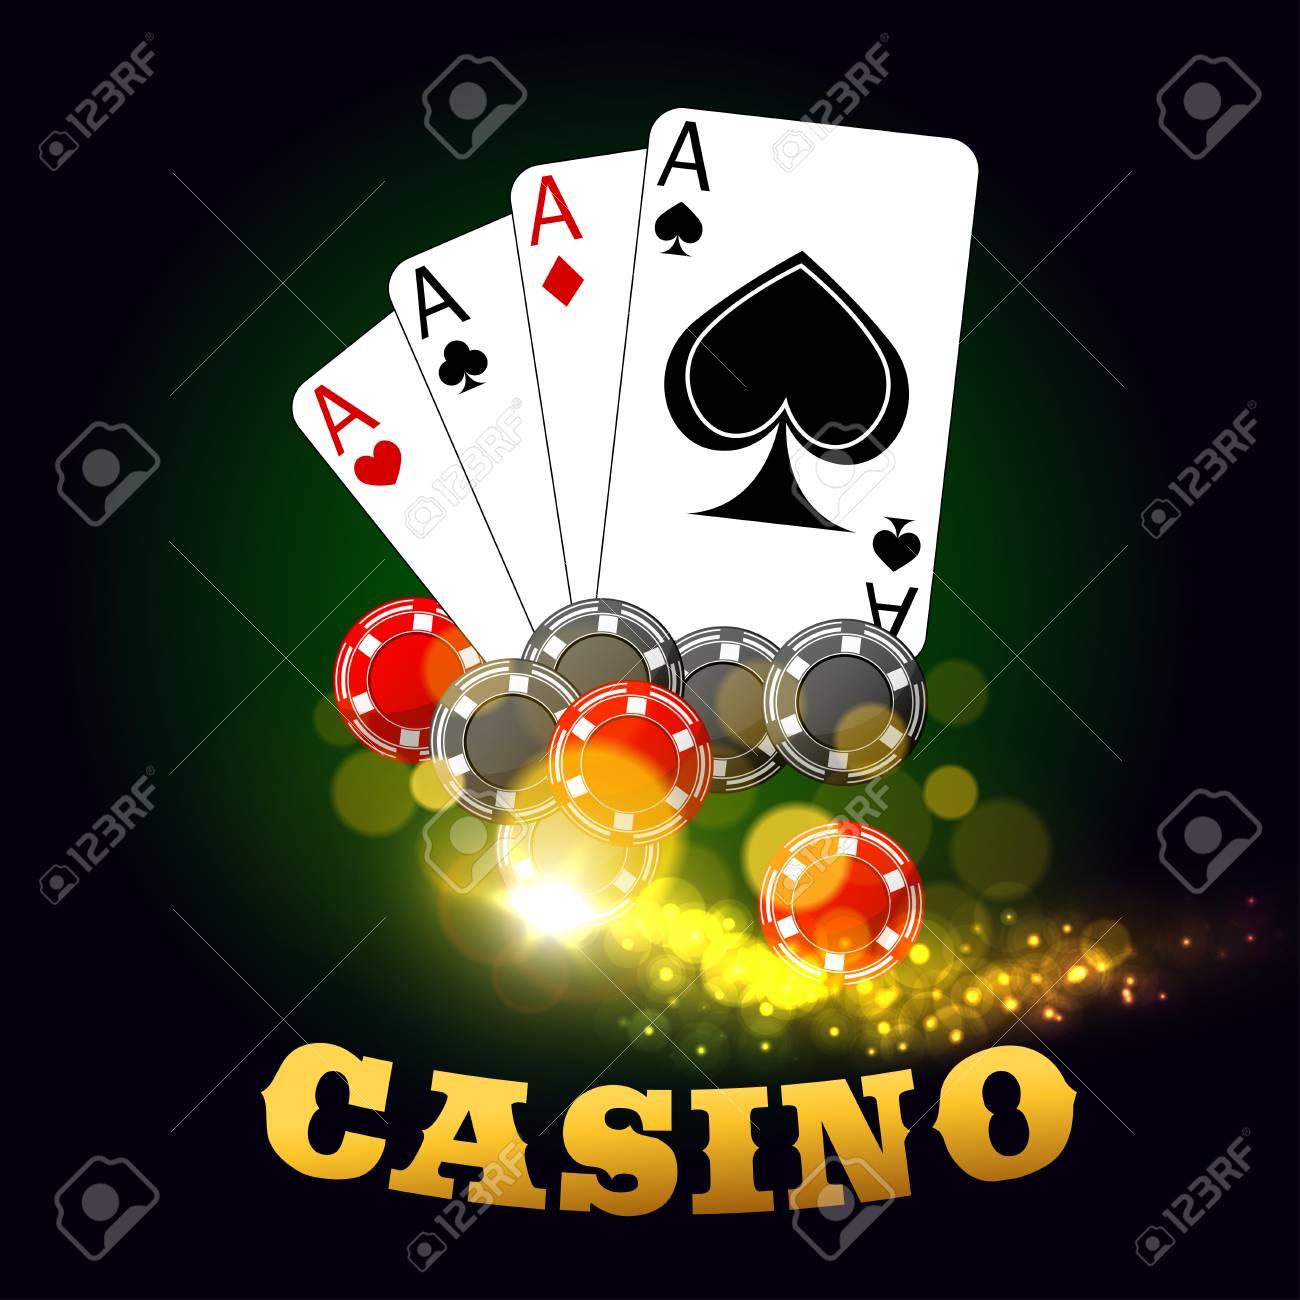 Permanent 750 powerful Casino,  Gambling,  Poker,  Sports High Quality Web2.0 Backlinks